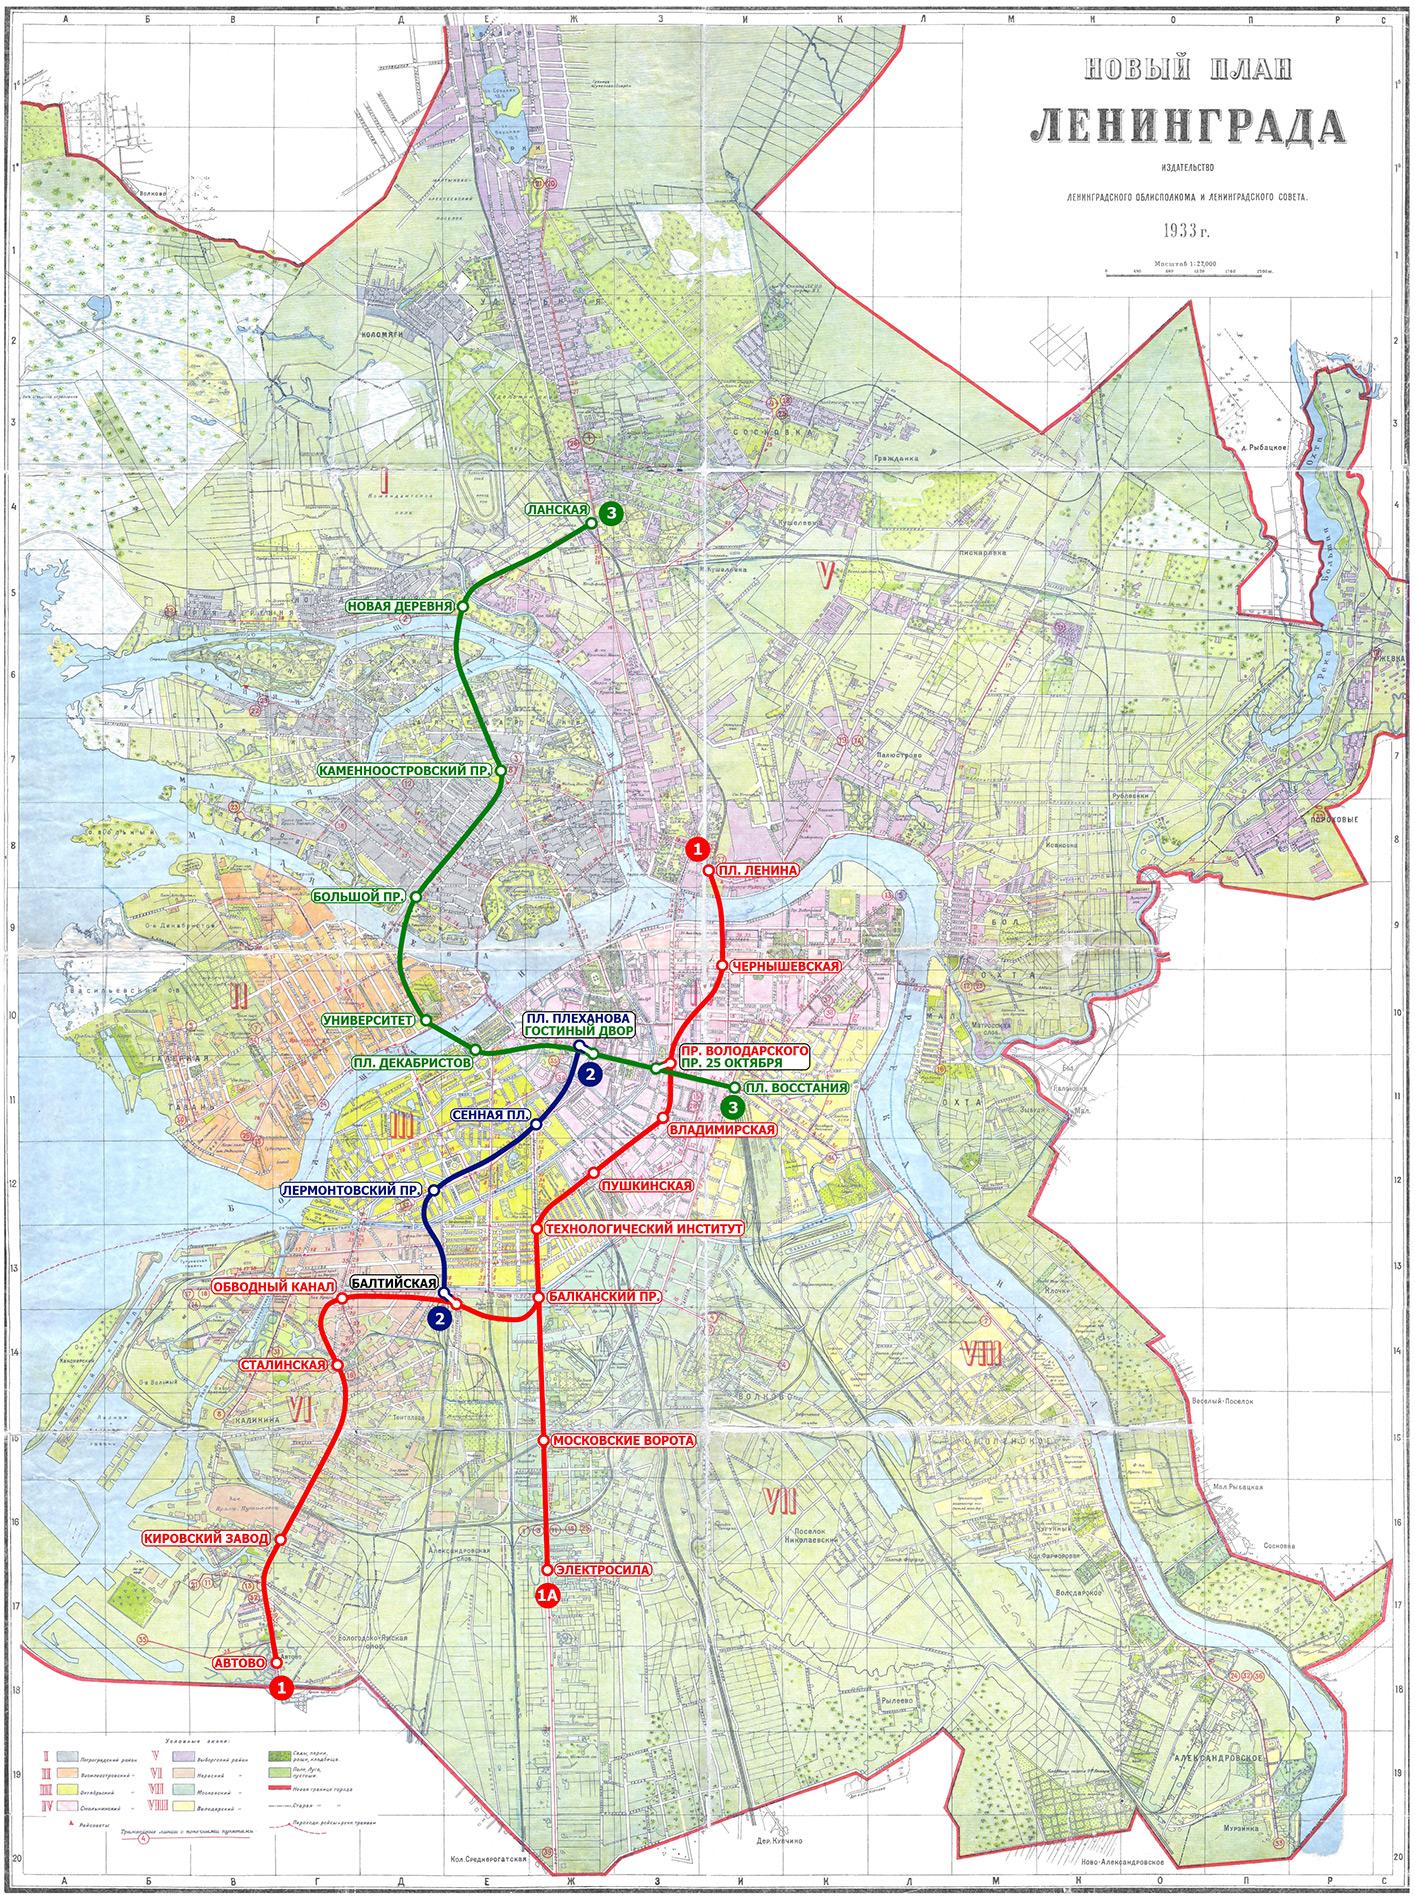 перспективы метрополитена схема